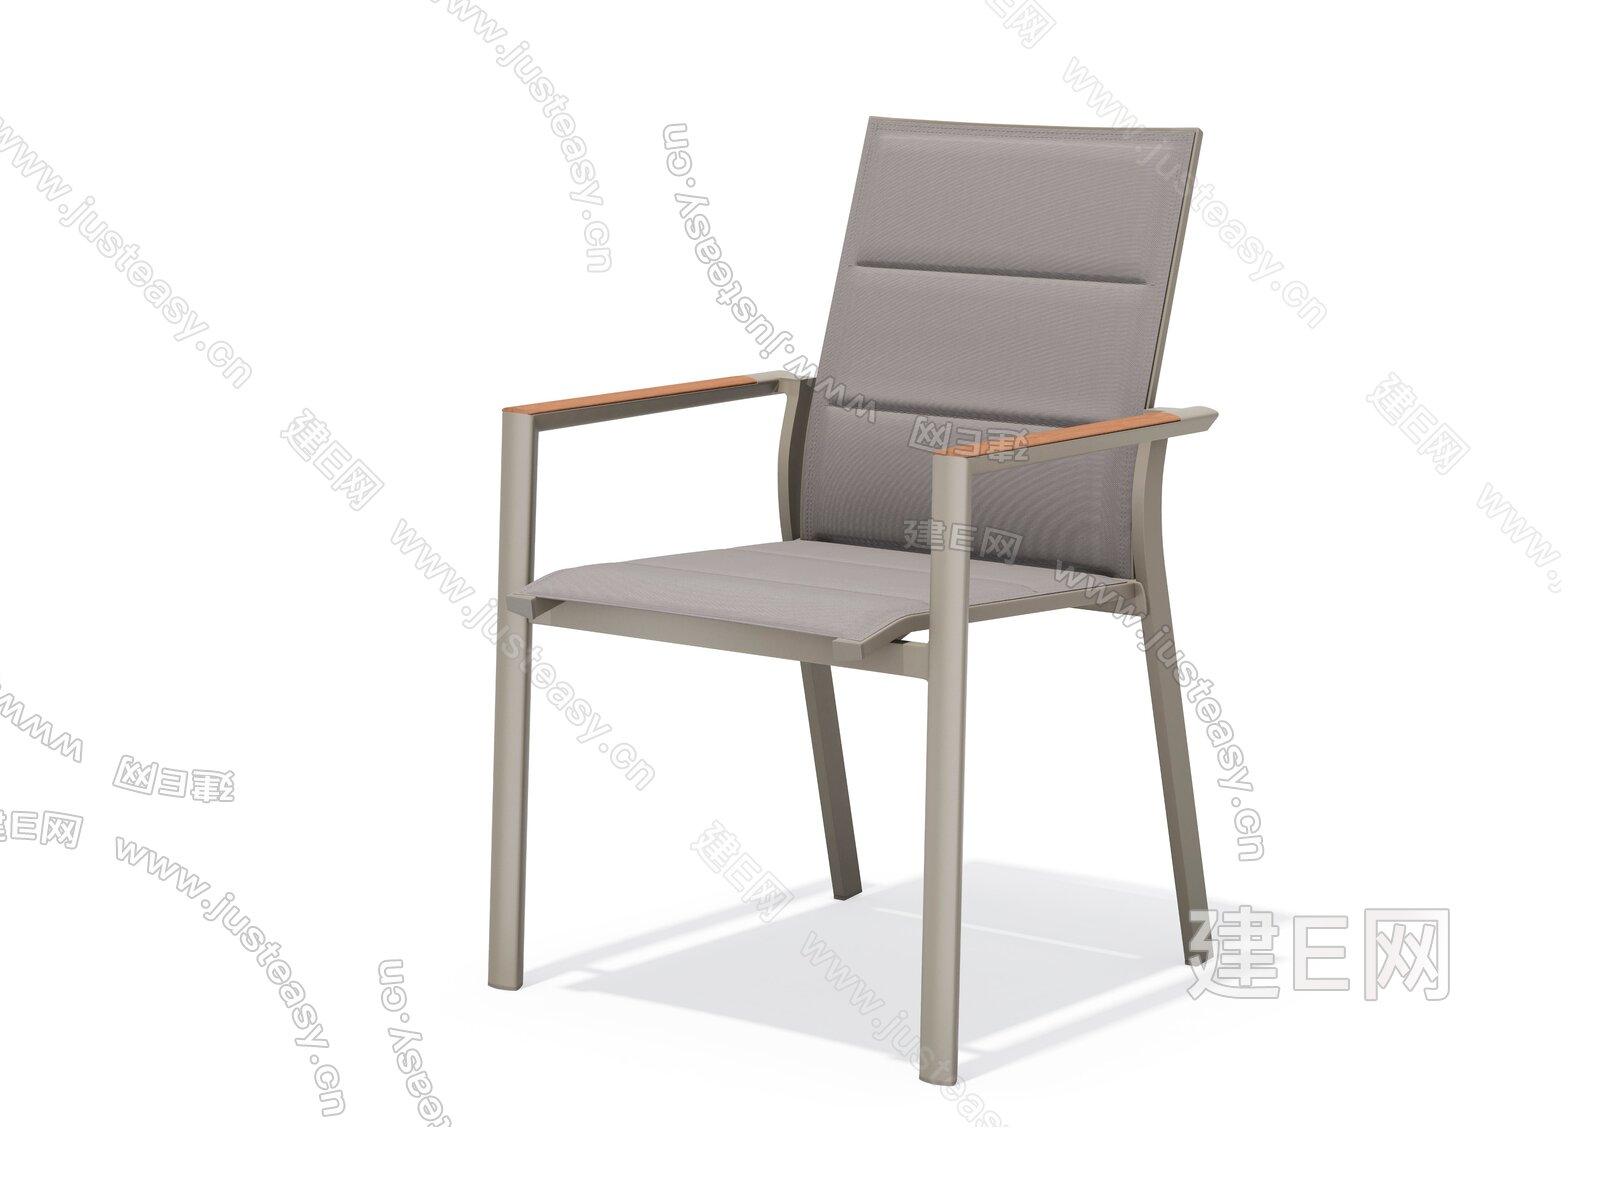 sunair 诗乐尔  现代网布椅3d模型